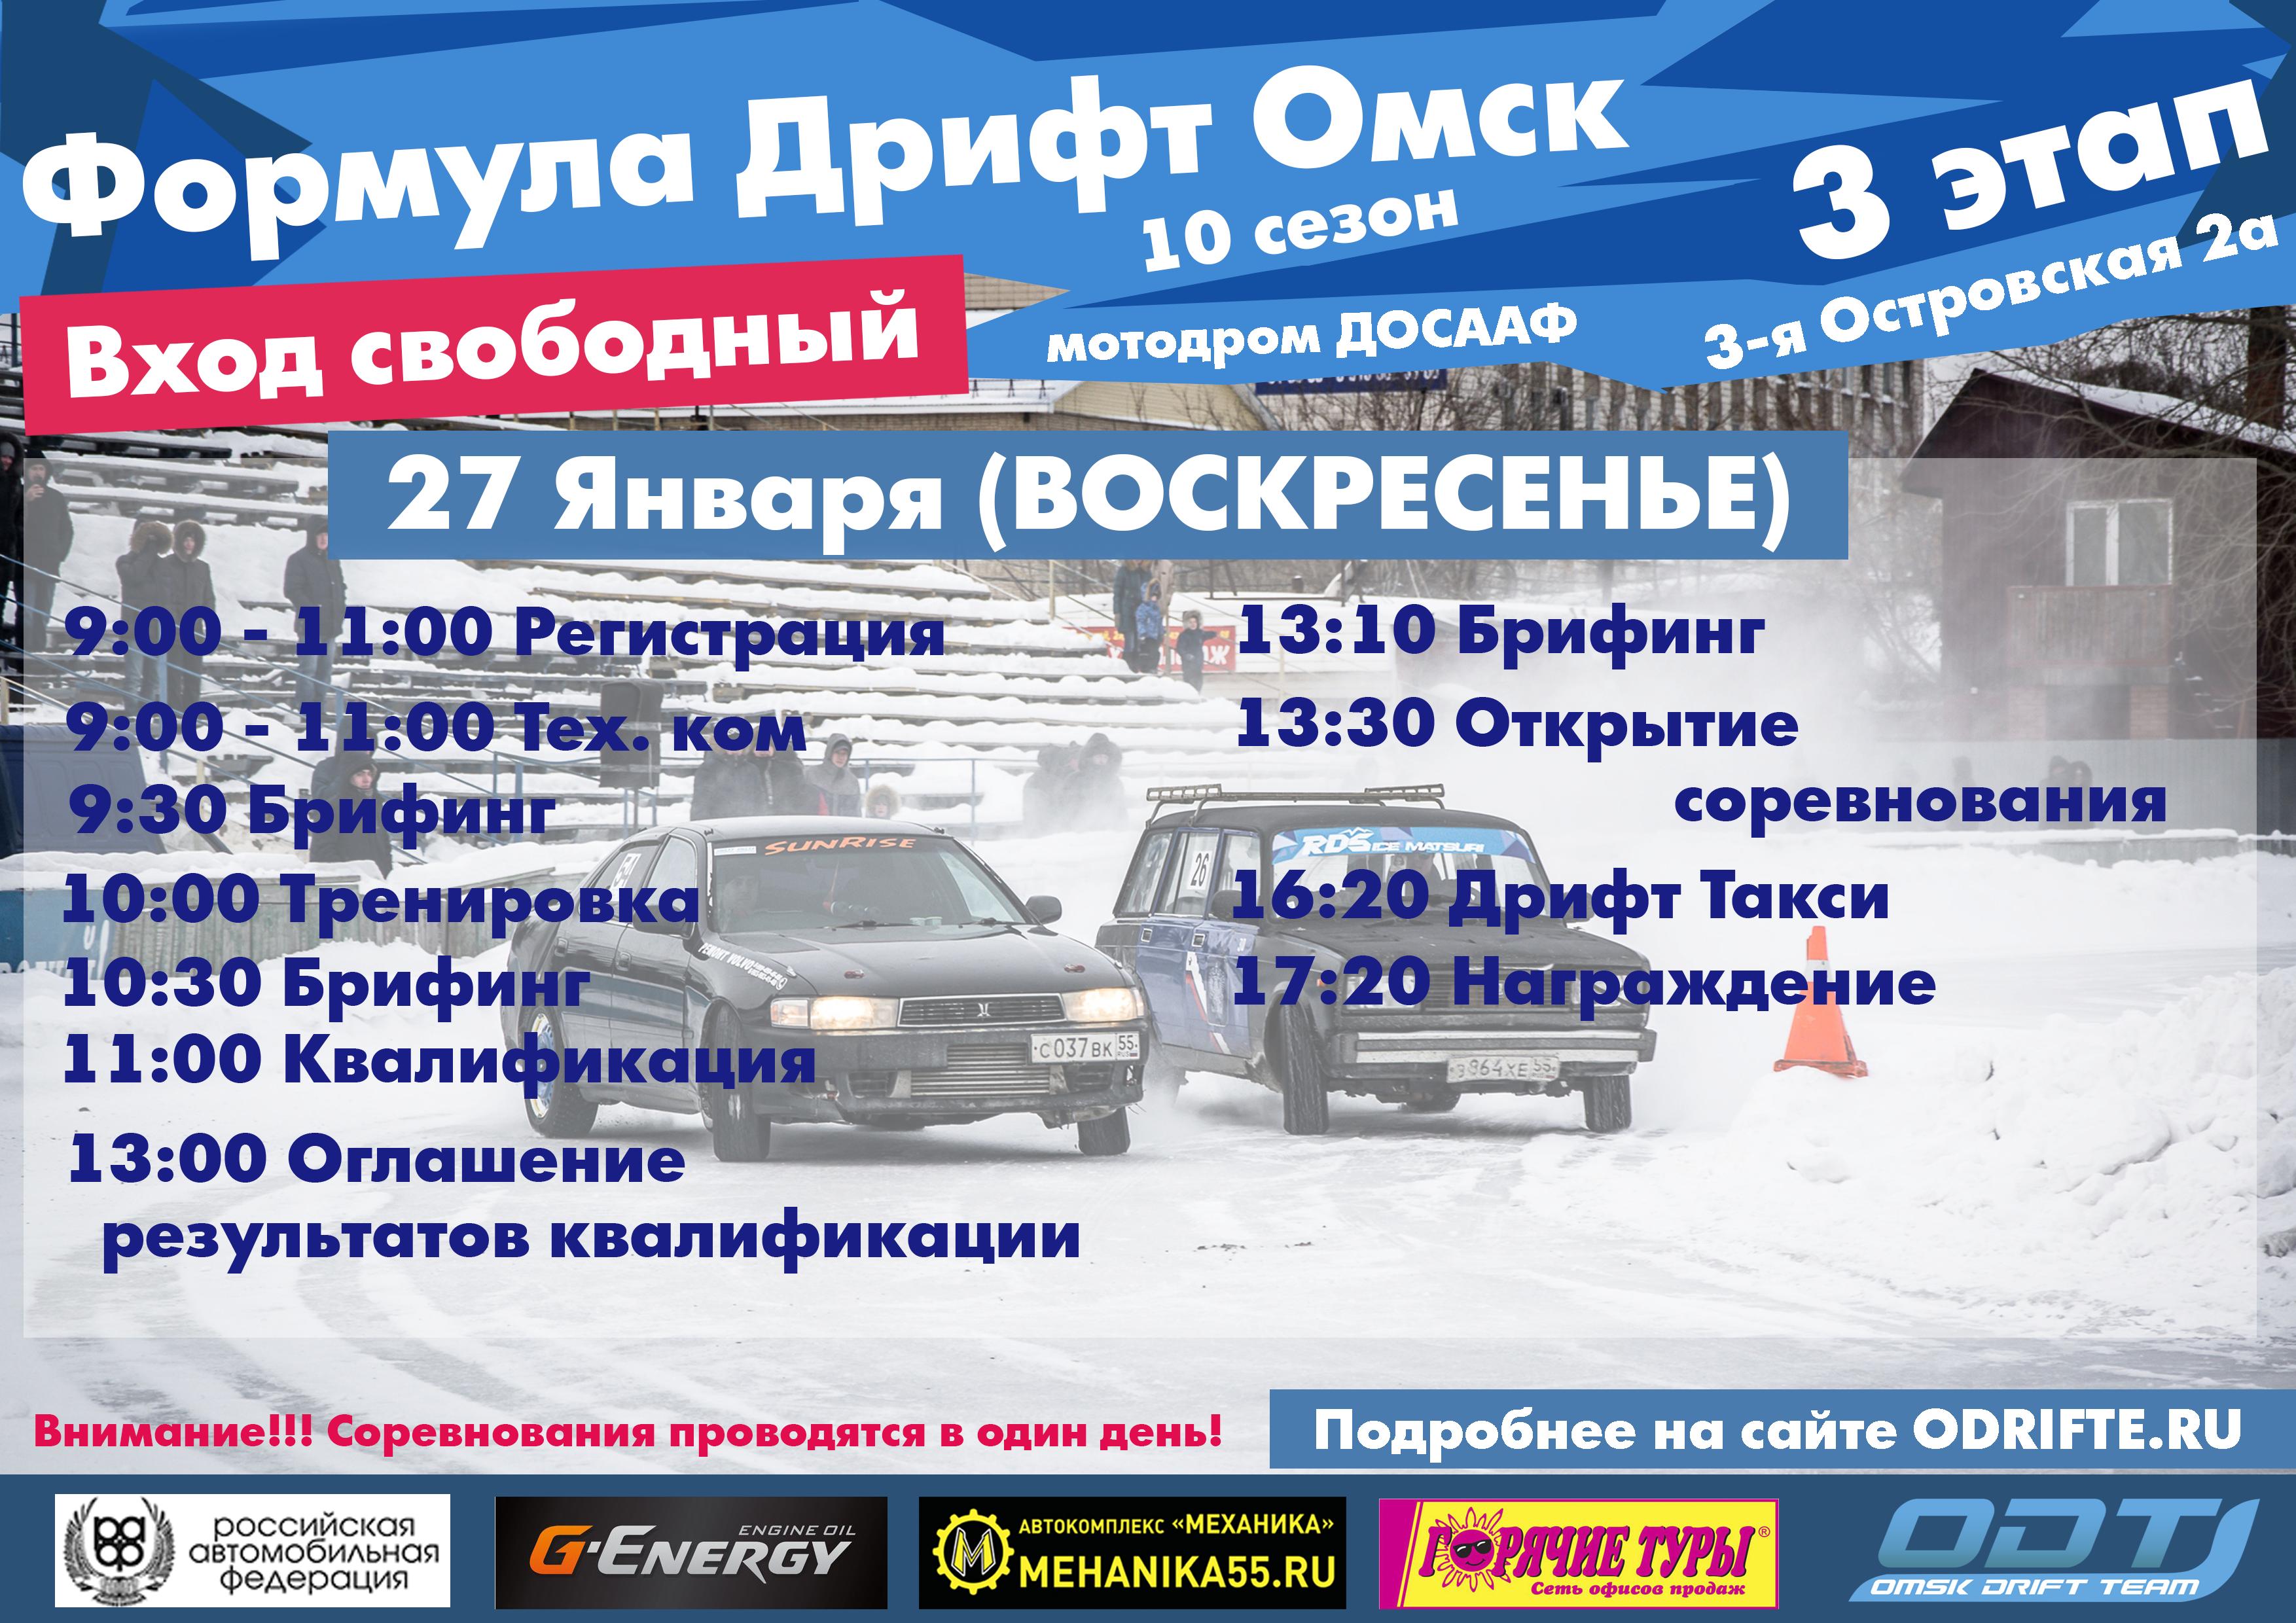 III Этап Кубка Омской области по дрифту «Формула Дрифт Омск. ЗИМА 2018-2019